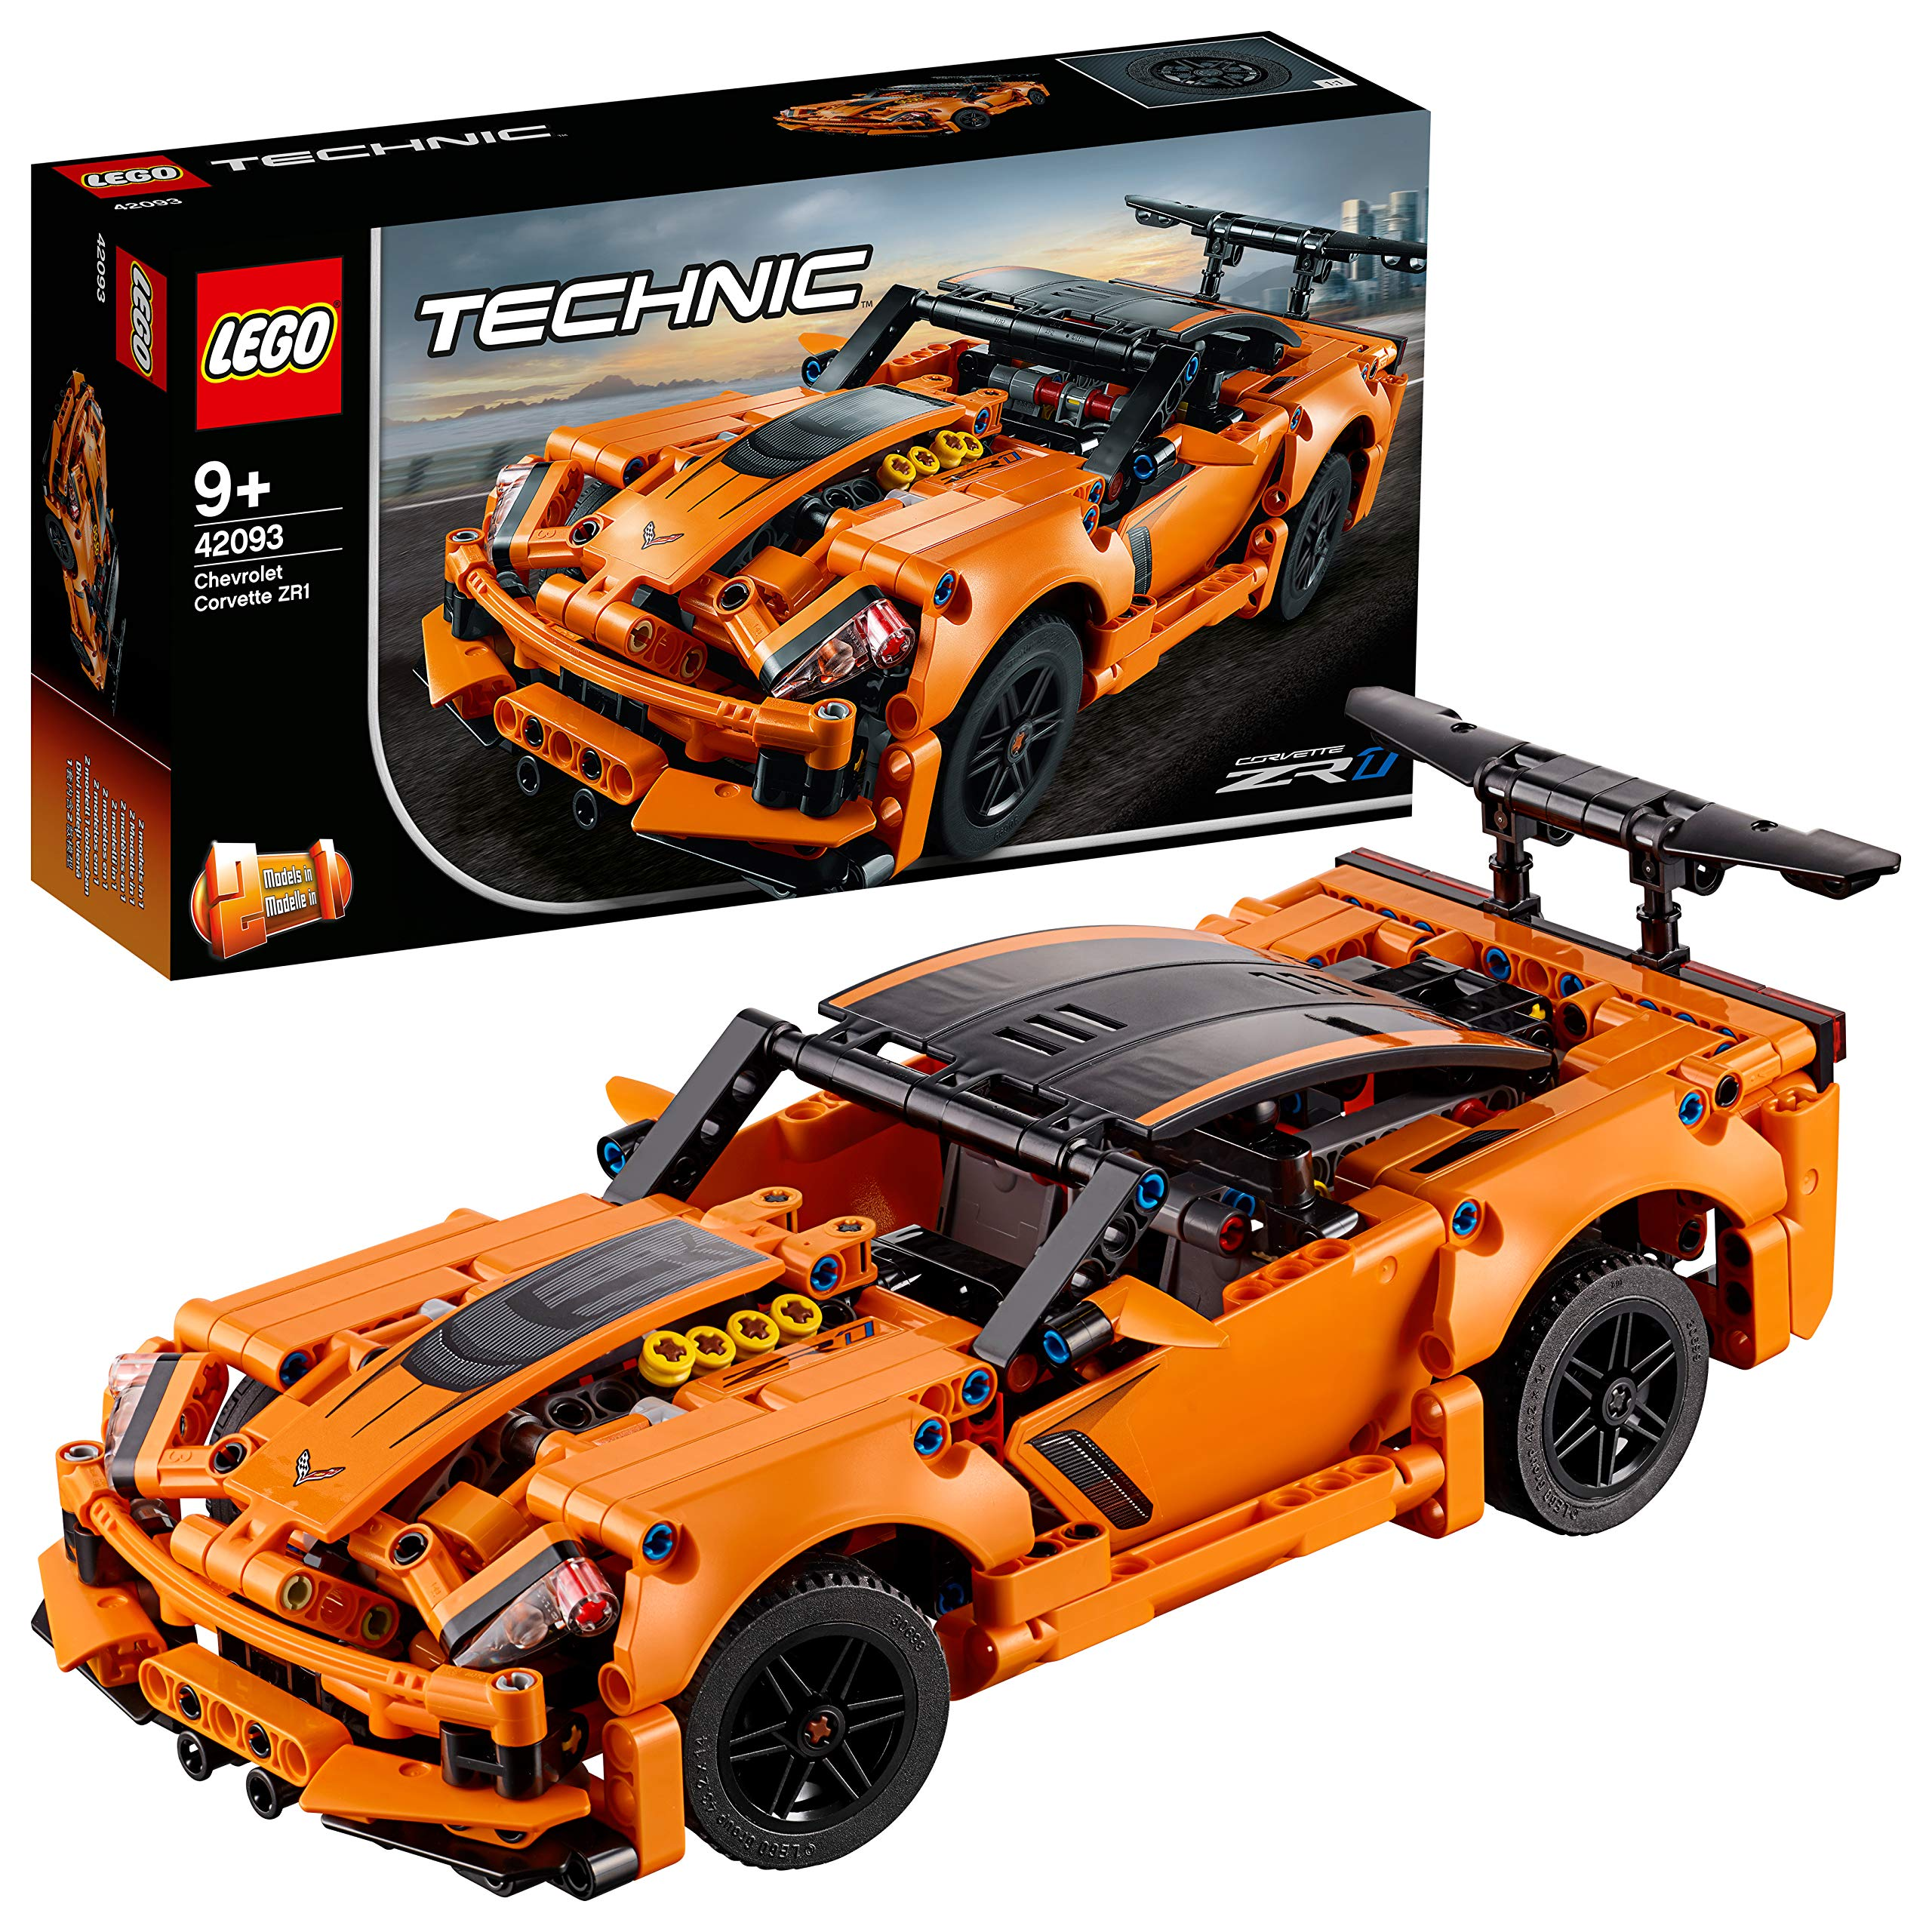 LEGO Technic Chevrolet Corvette Building